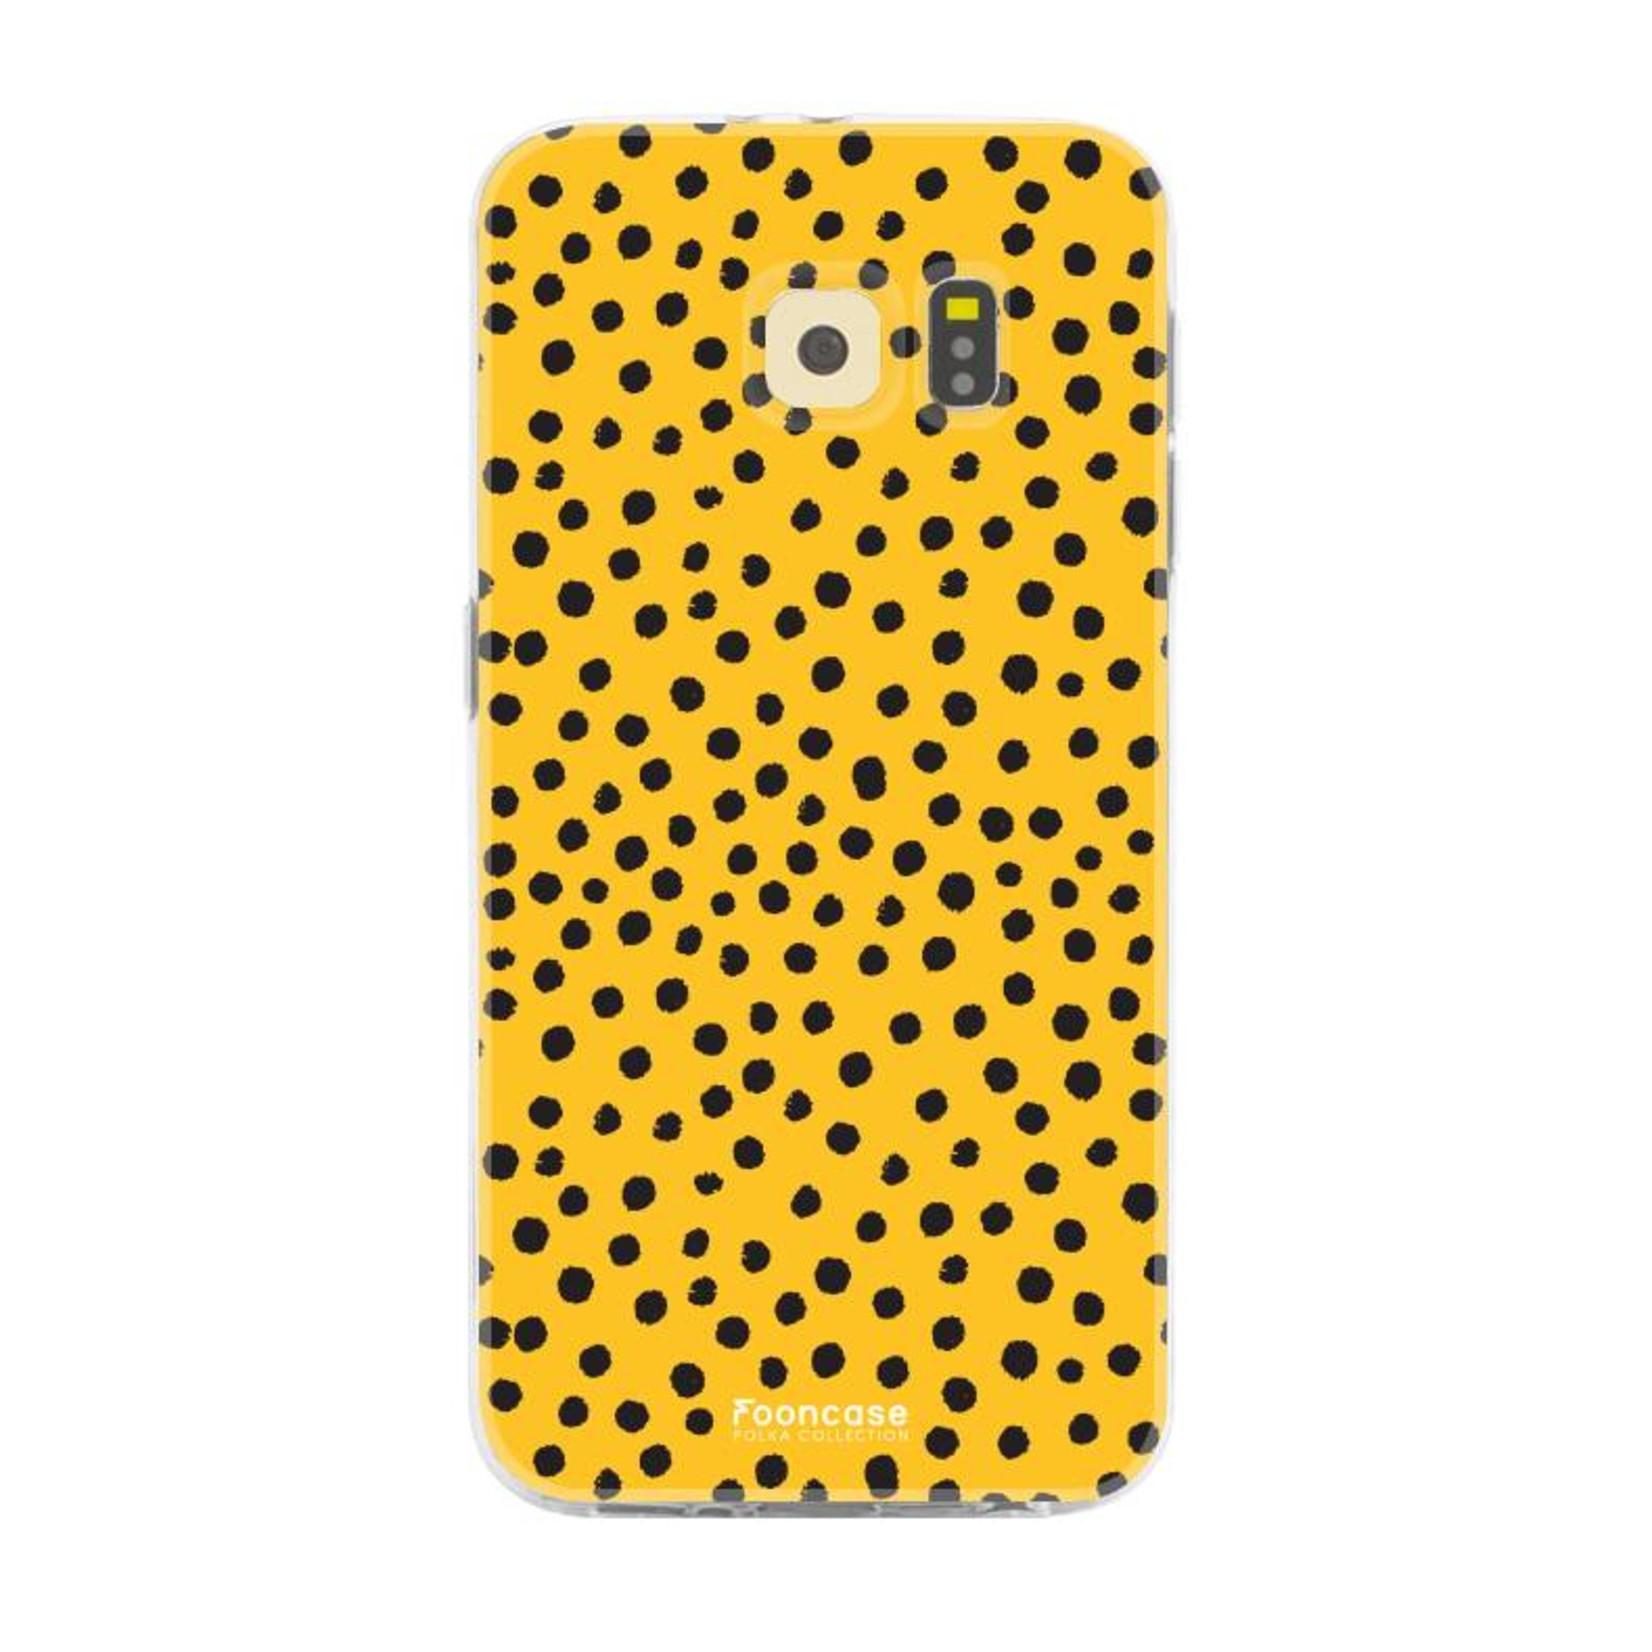 FOONCASE Samsung Galaxy S6 hoesje TPU Soft Case - Back Cover - POLKA COLLECTION / Stipjes / Stippen / Oker Geel